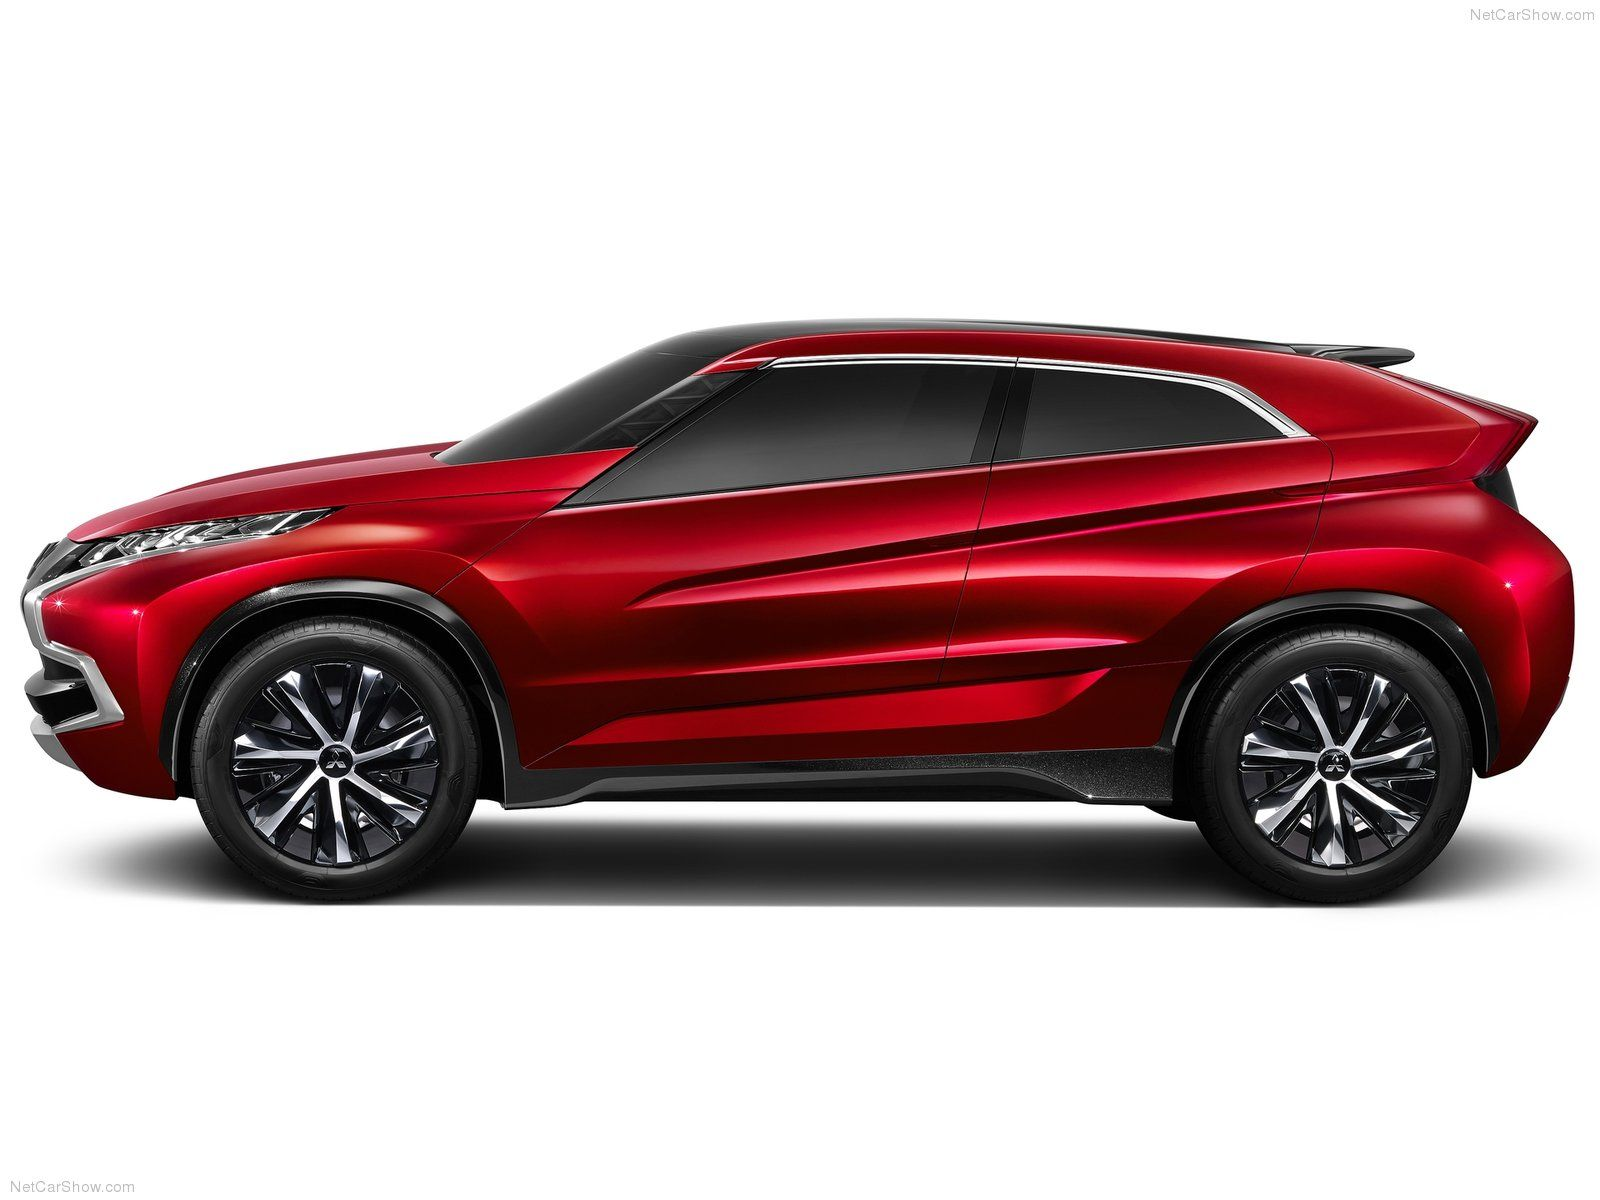 2013 mitsubishi xr phev concept car